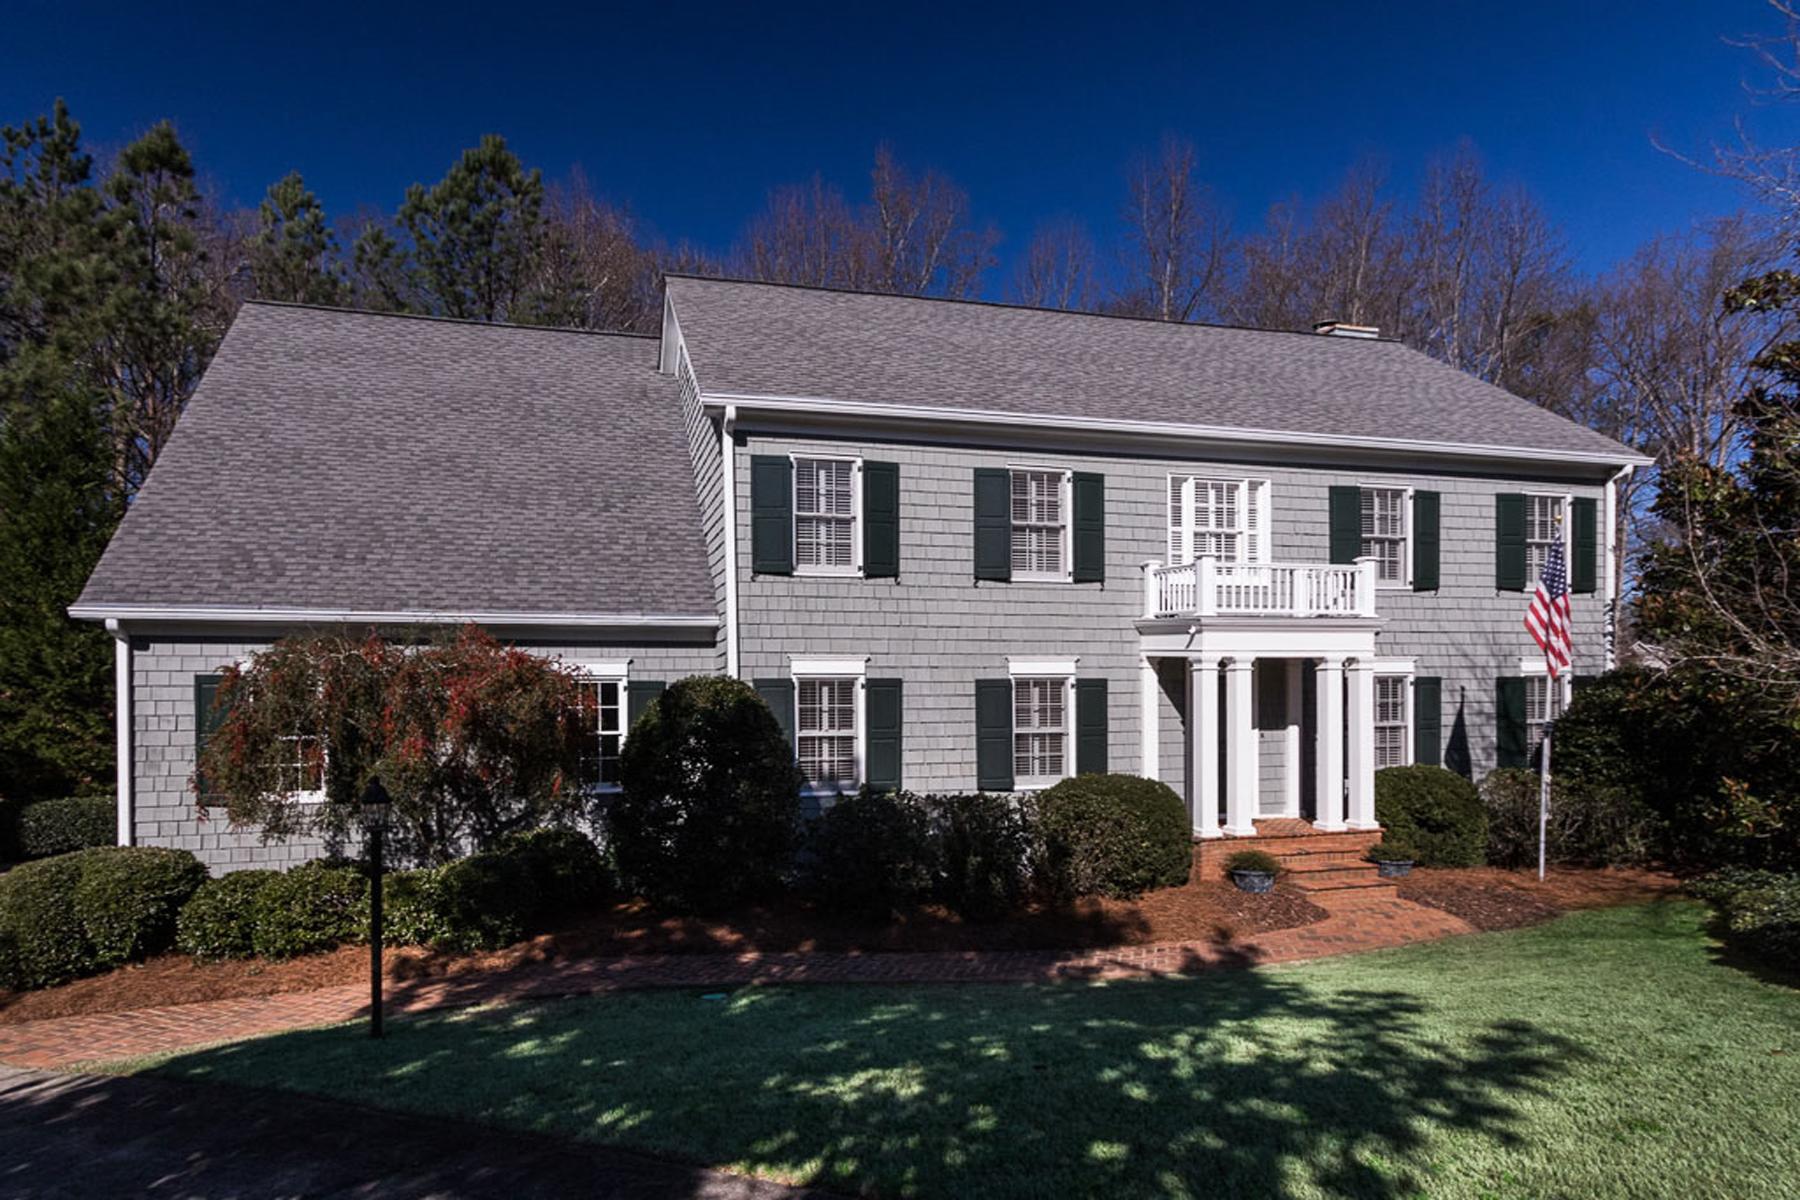 Single Family Home for Sale at Spectacular Buckhead Home On Cul-de-sac 1180 Northmoor Court NW Buckhead, Atlanta, Georgia 30327 United States